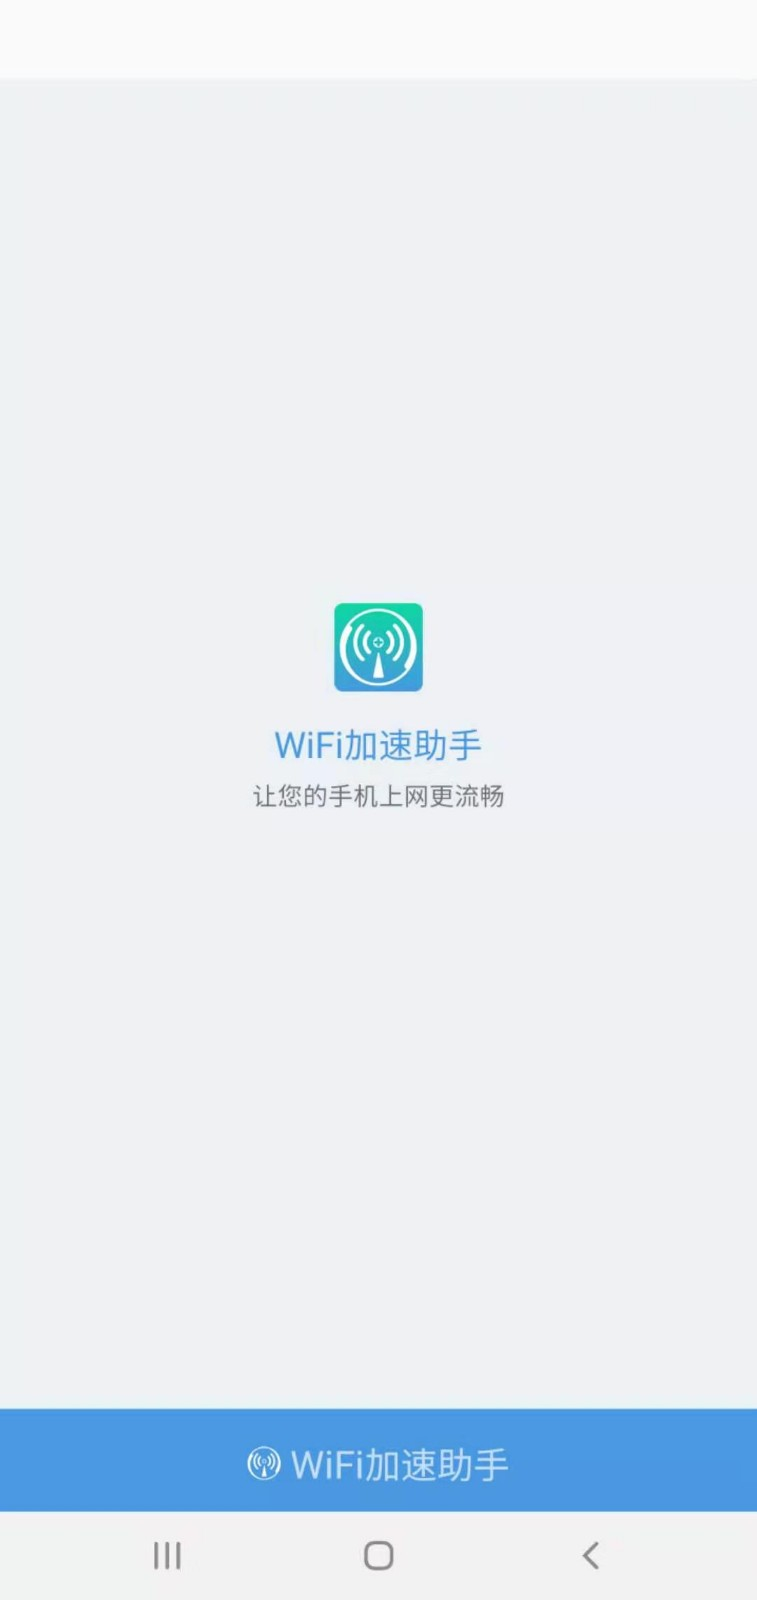 WiFi加速助手